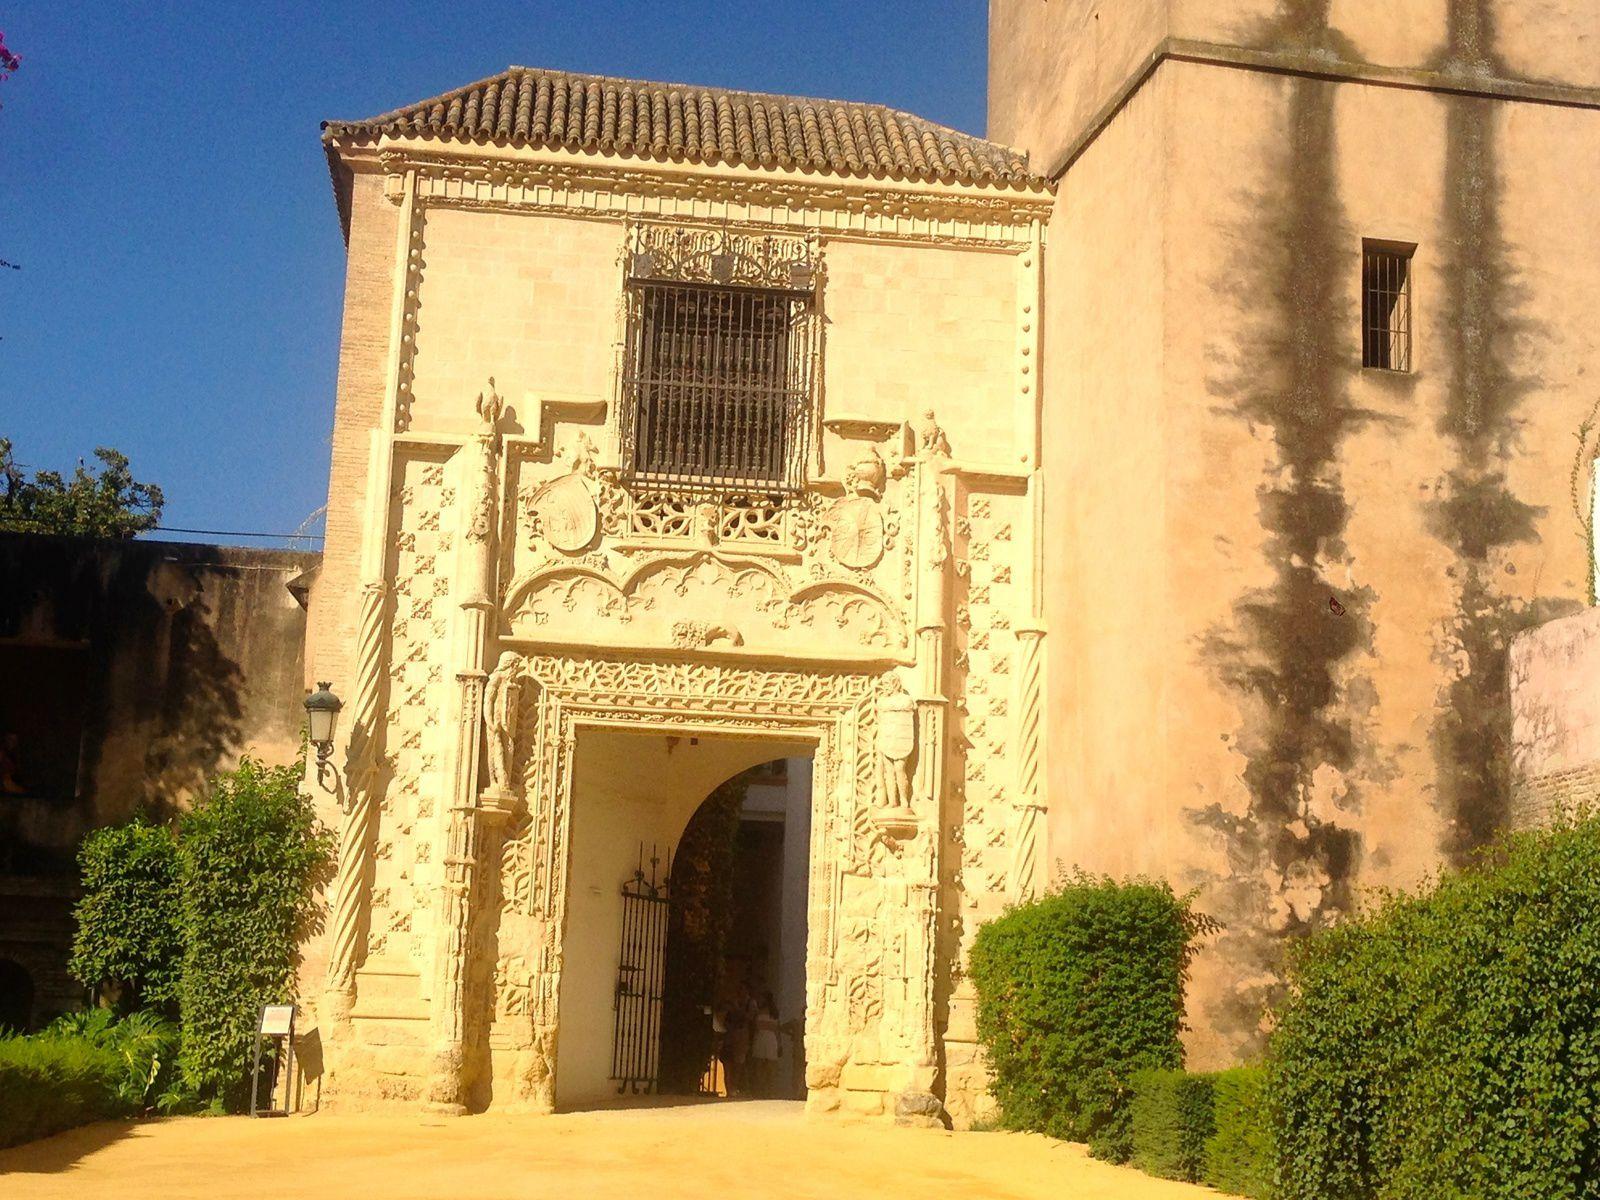 Puerta de Marchena – Porte Marchena